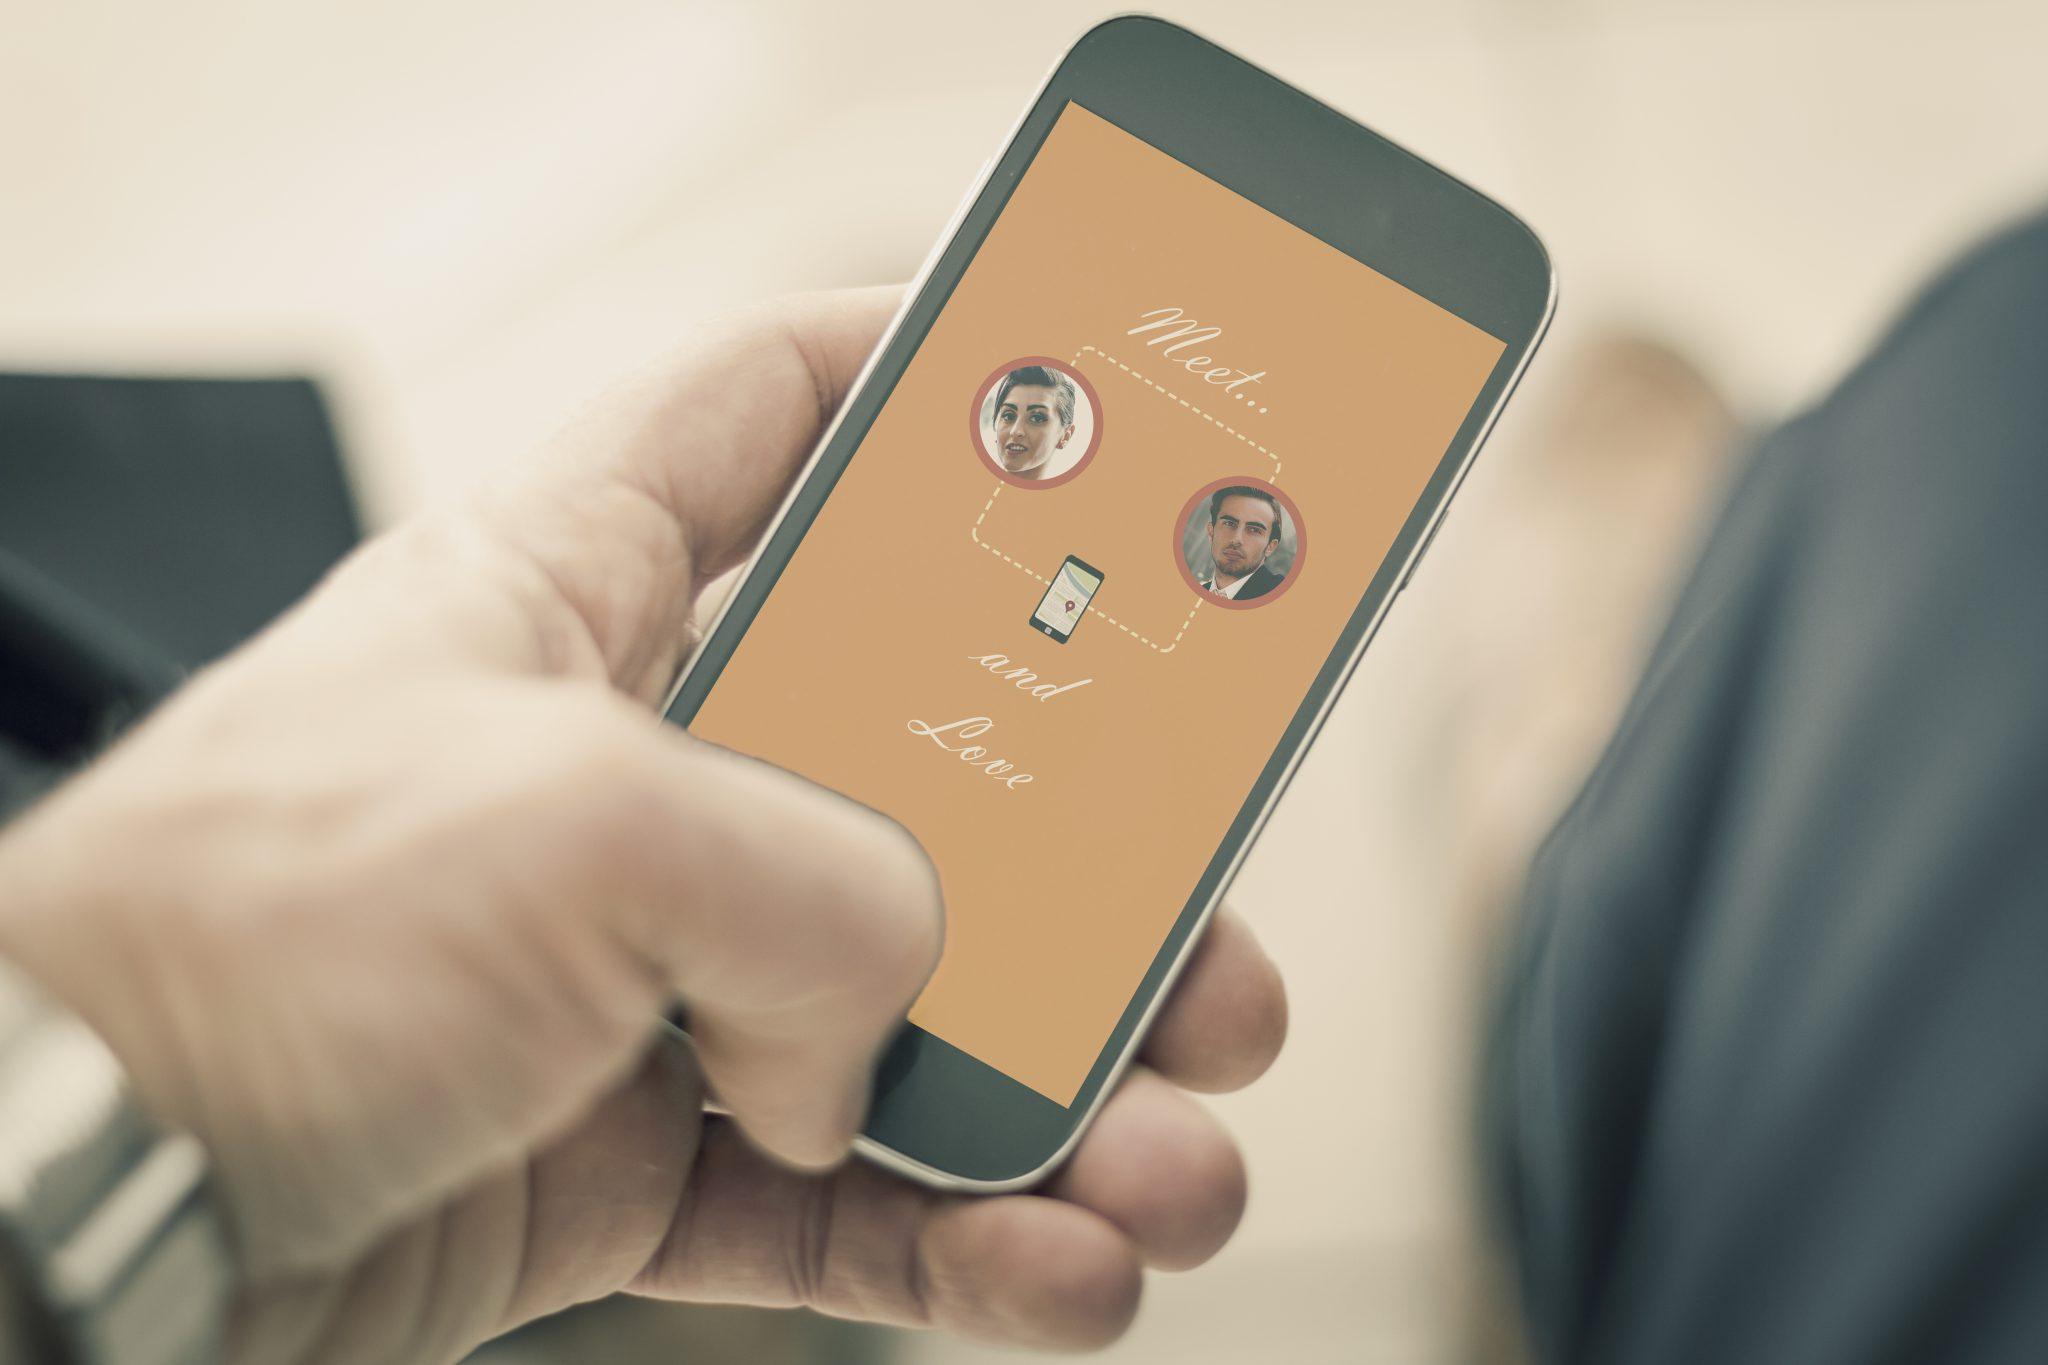 Marketing dating app